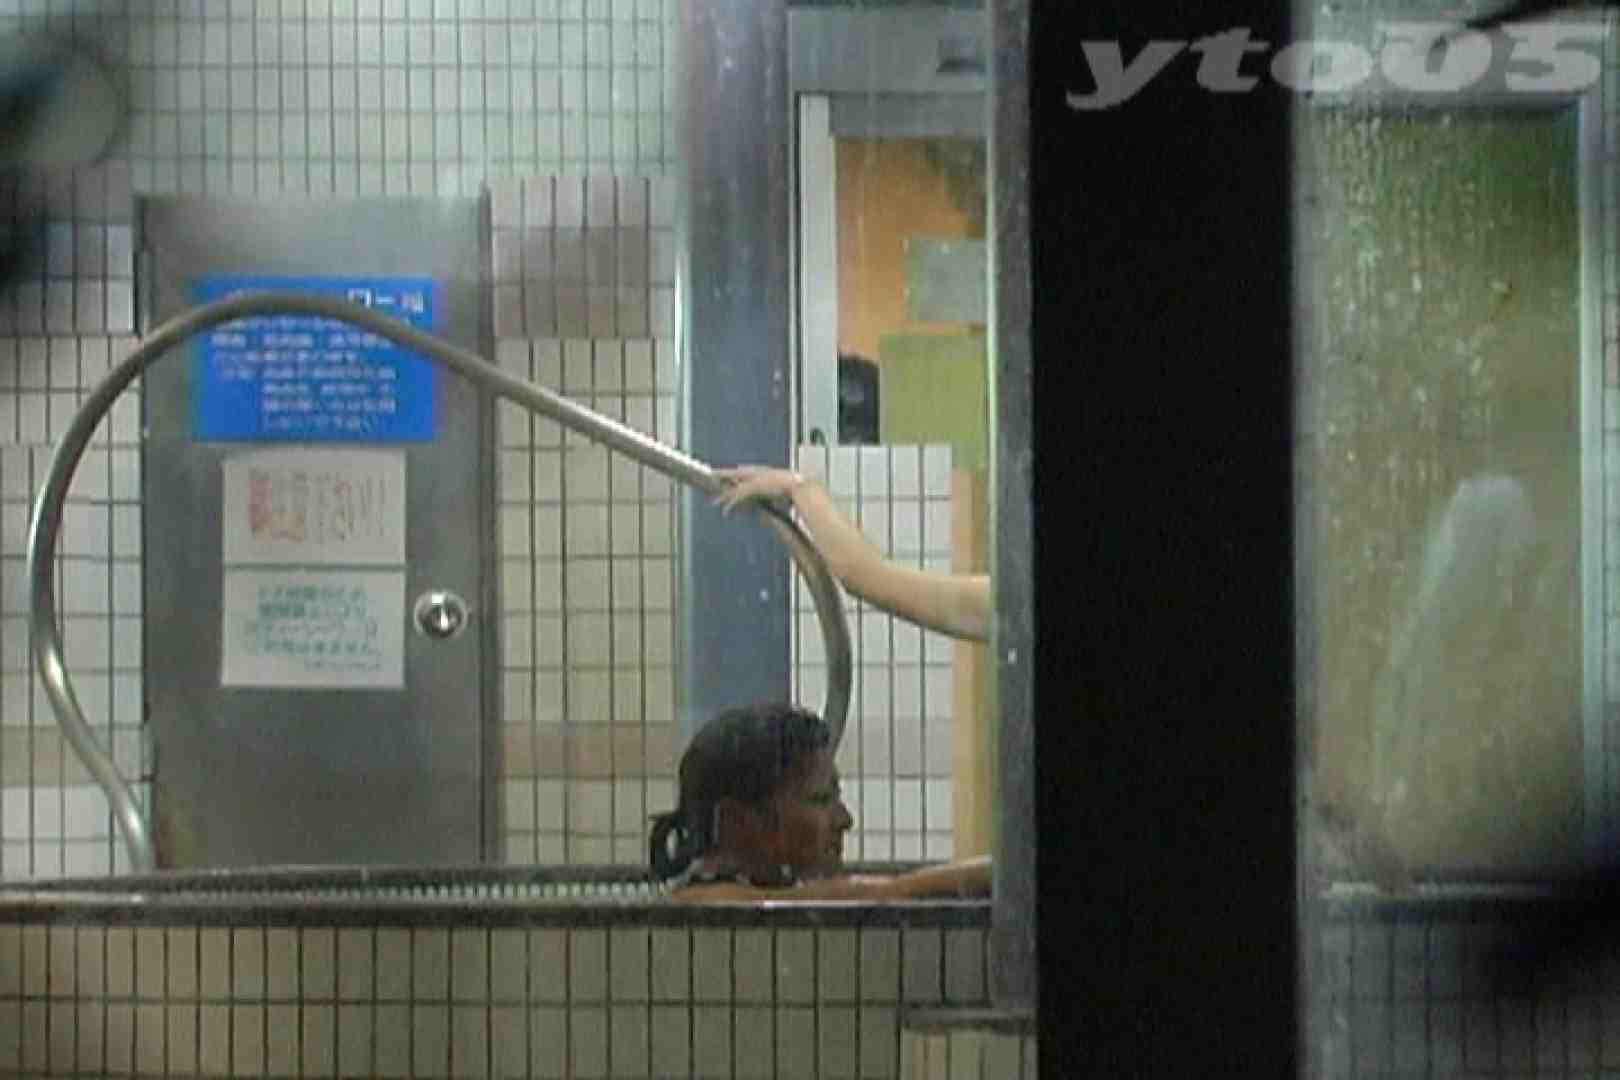 ▲復活限定▲合宿ホテル女風呂盗撮 Vol.31 盗撮で悶絶   女湯  94画像 57